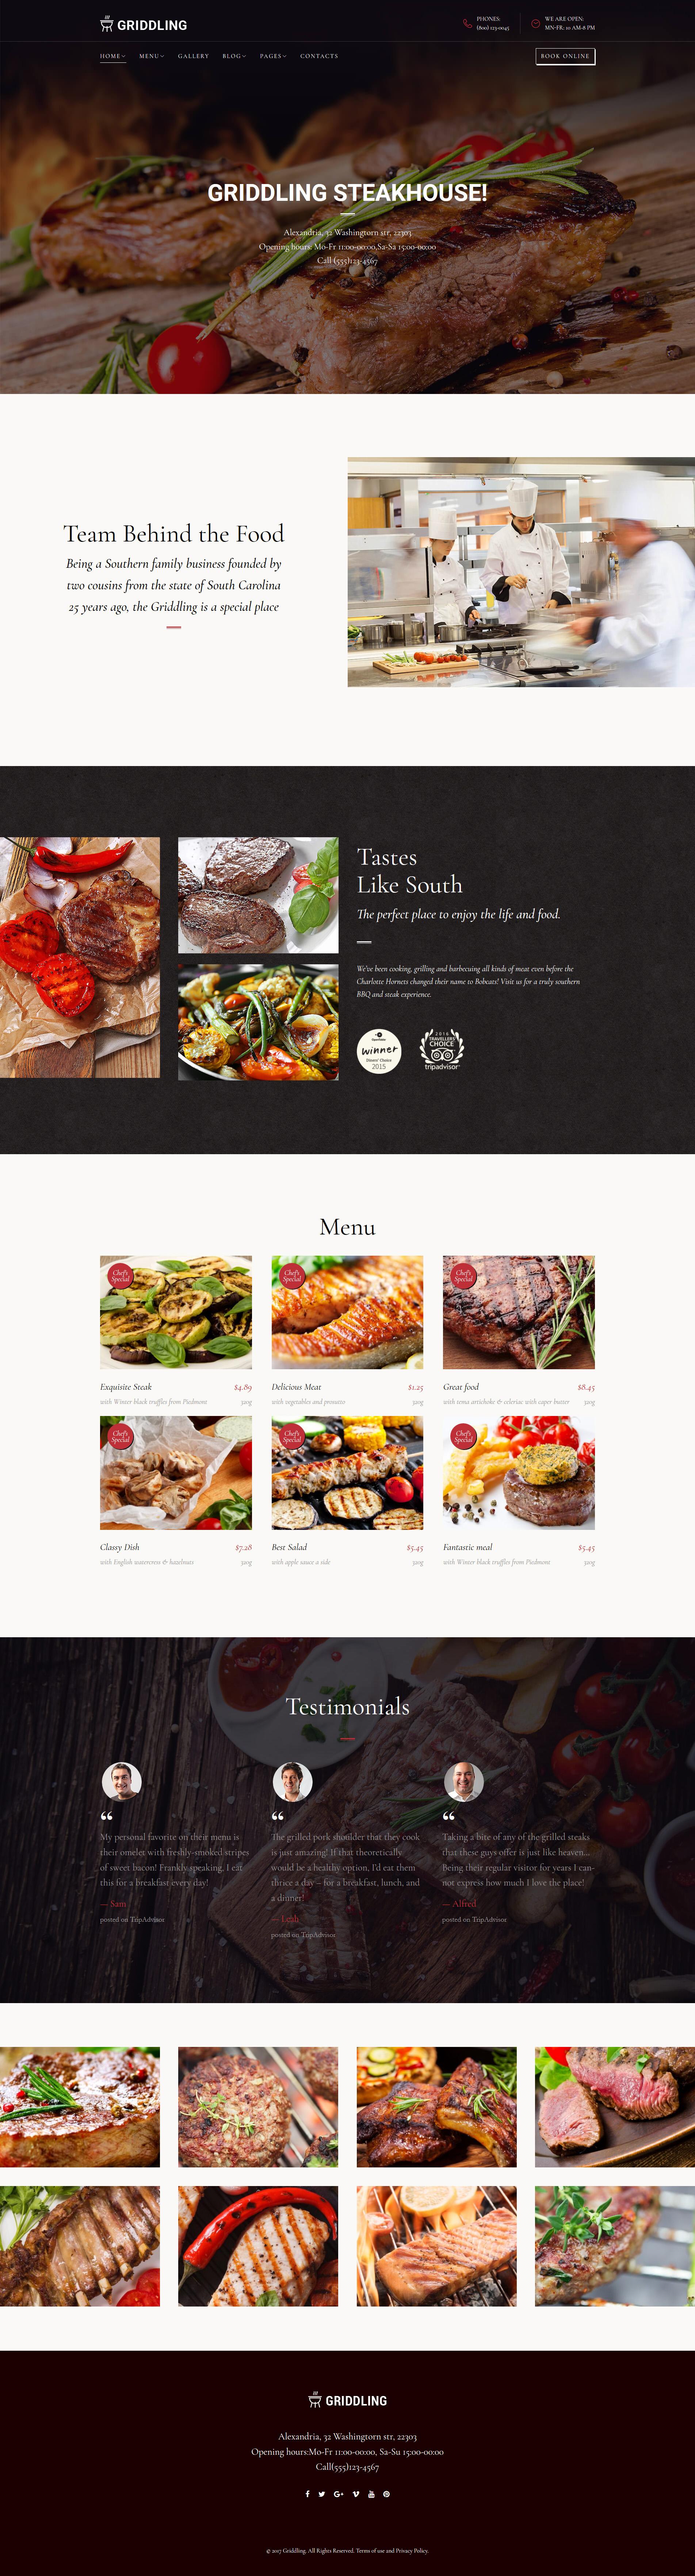 Шаблон Griddling для ресторана барбекю #63410